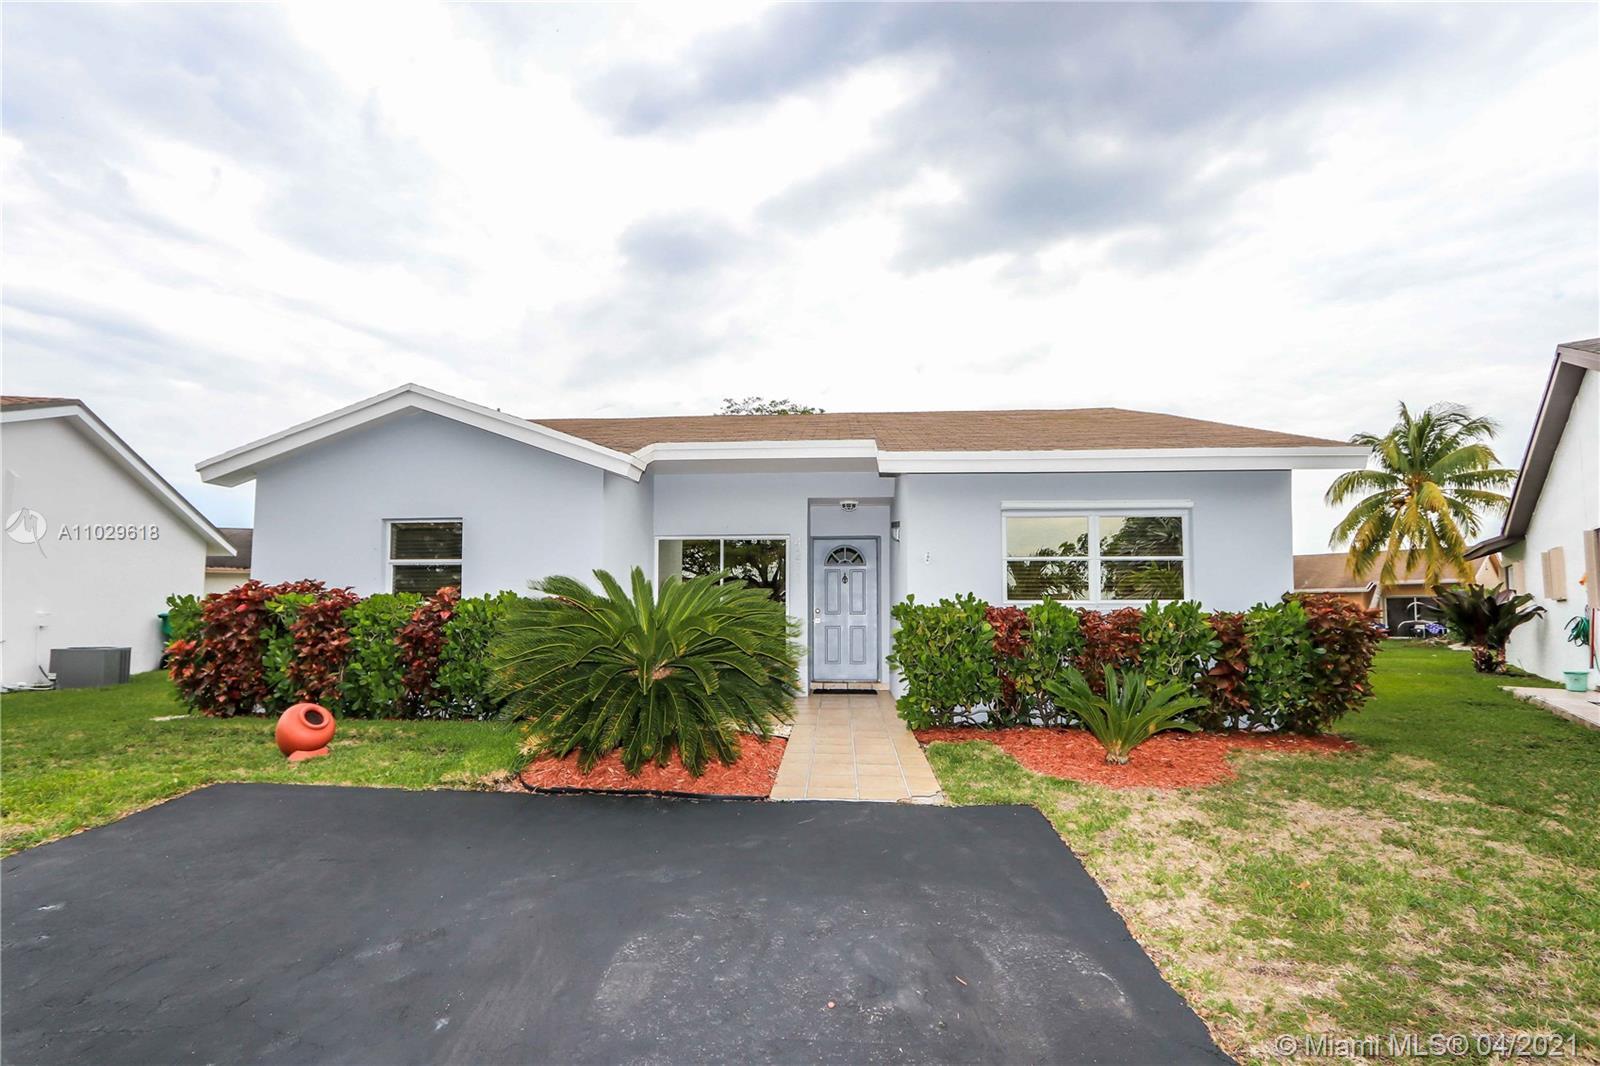 Bent Tree - 4211 SW 138th Pl, Miami, FL 33175